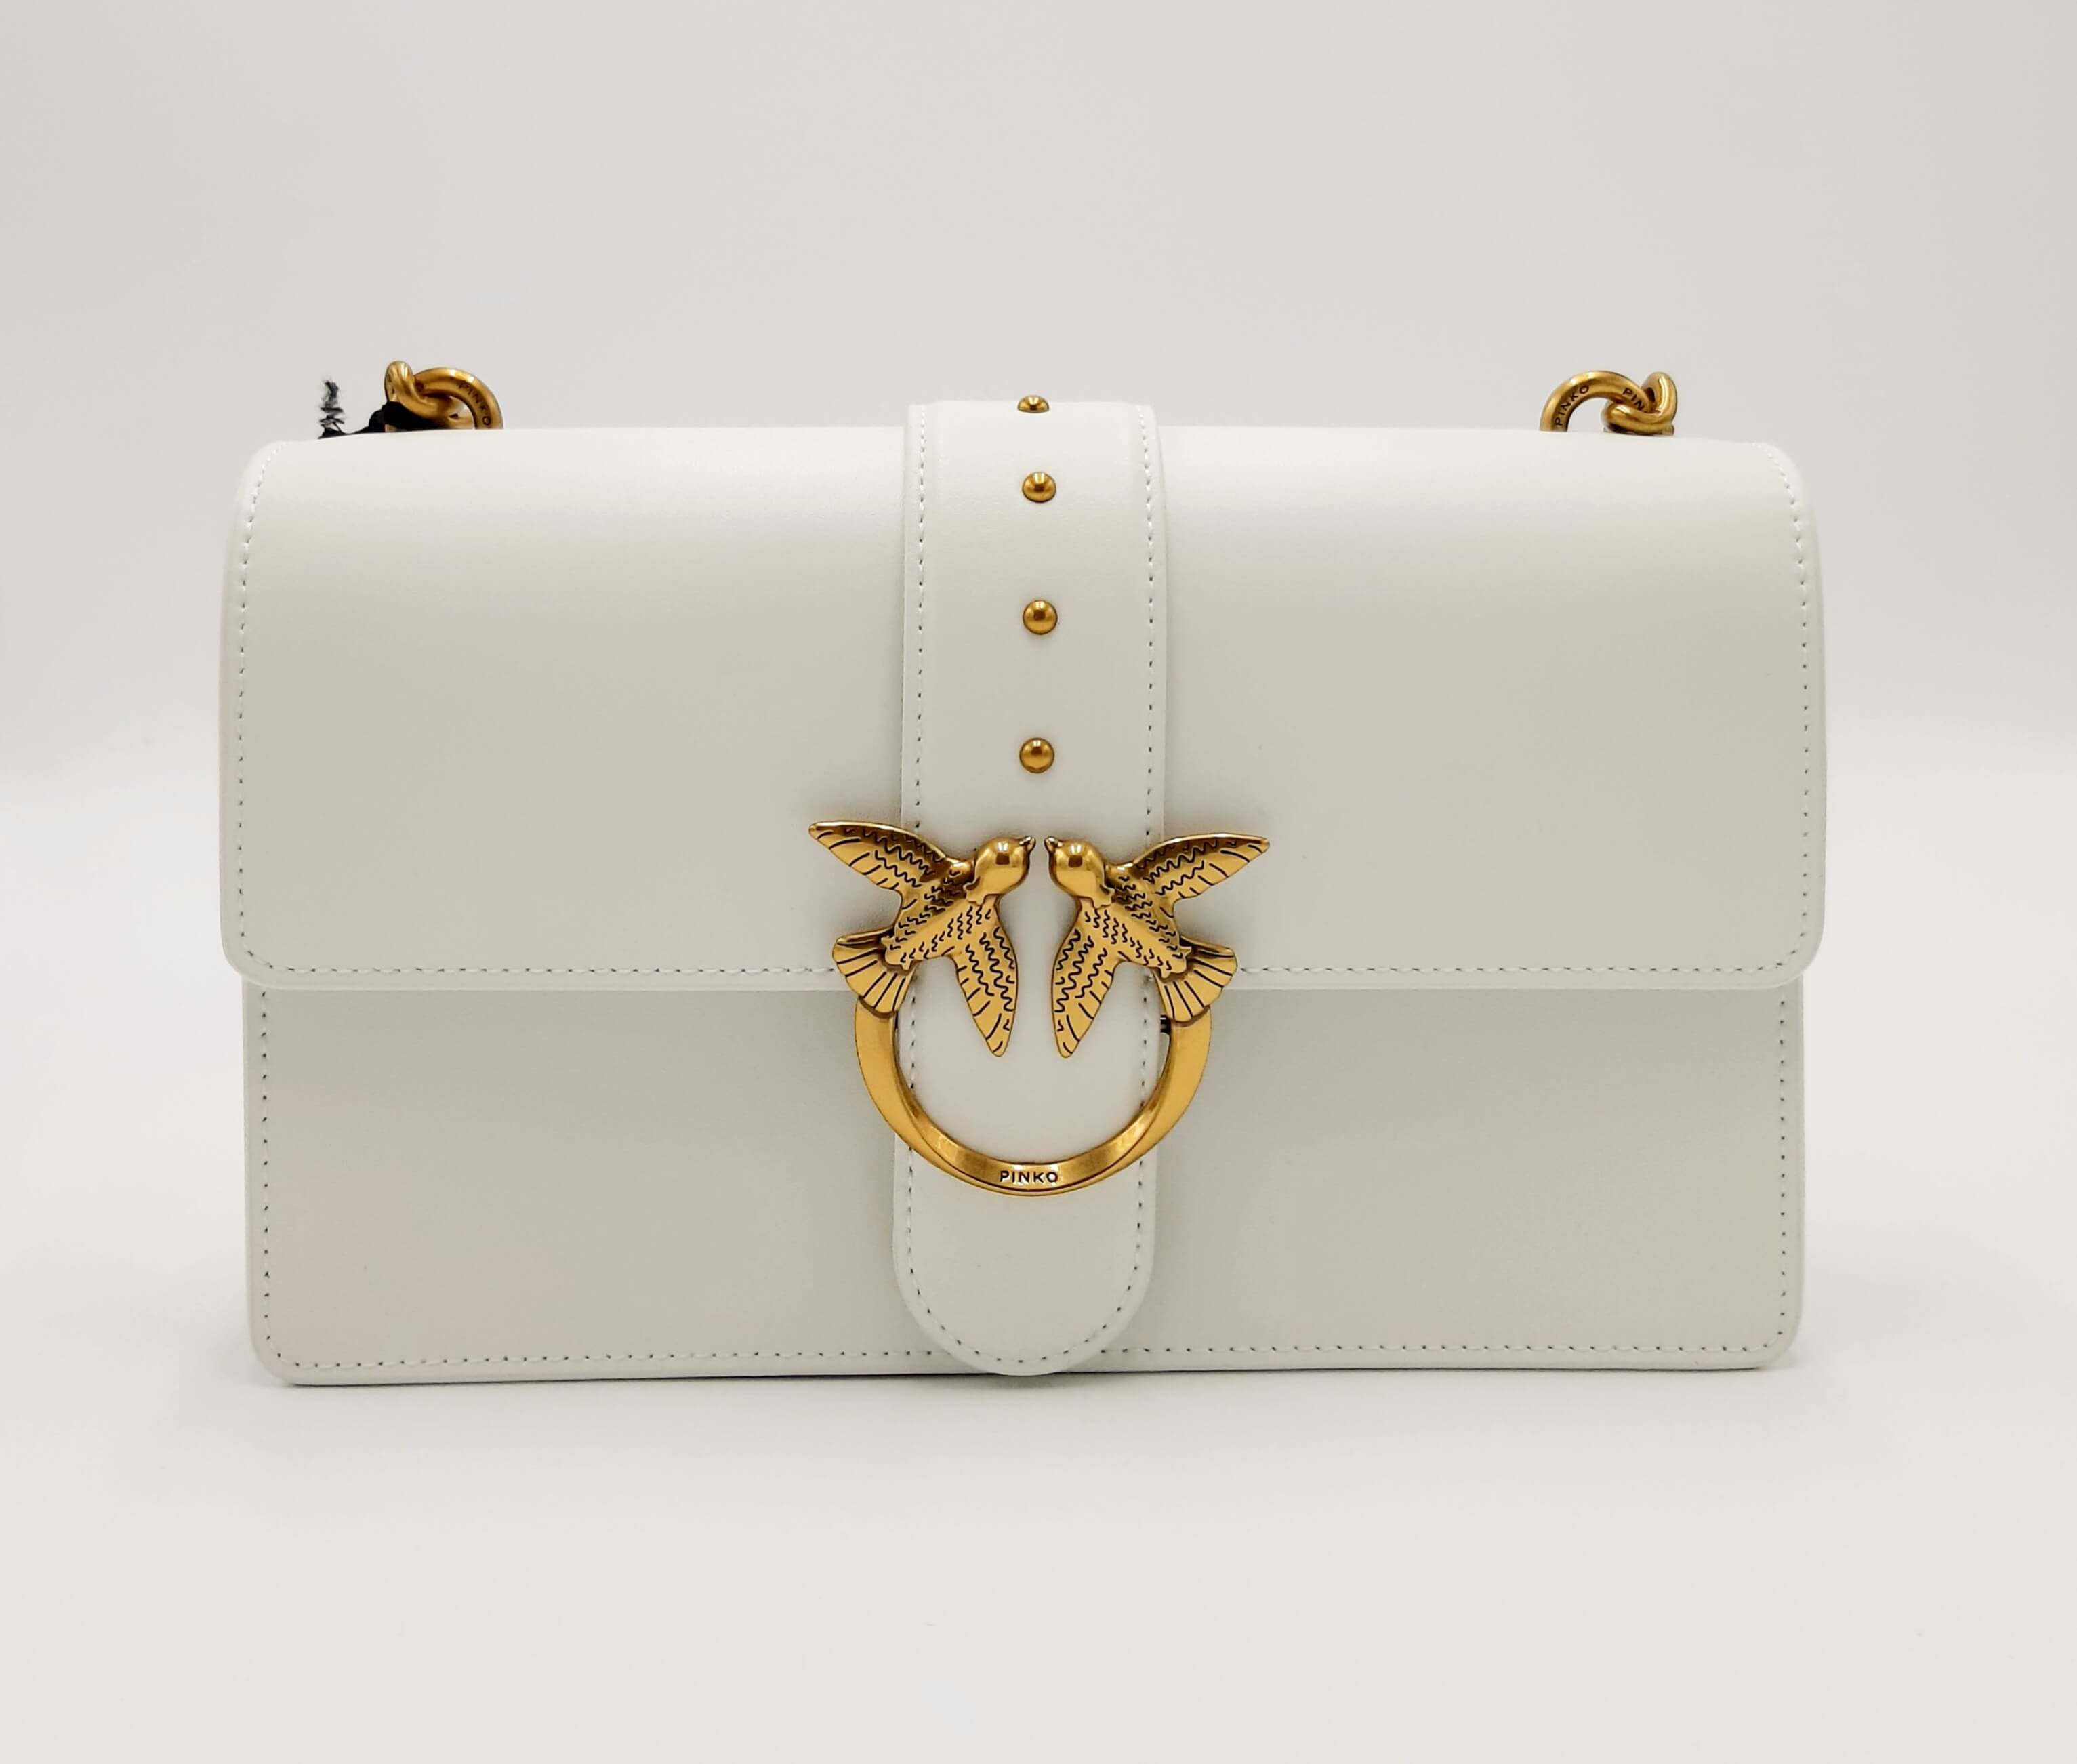 Tracolla Love bag classic bianca Pinko.